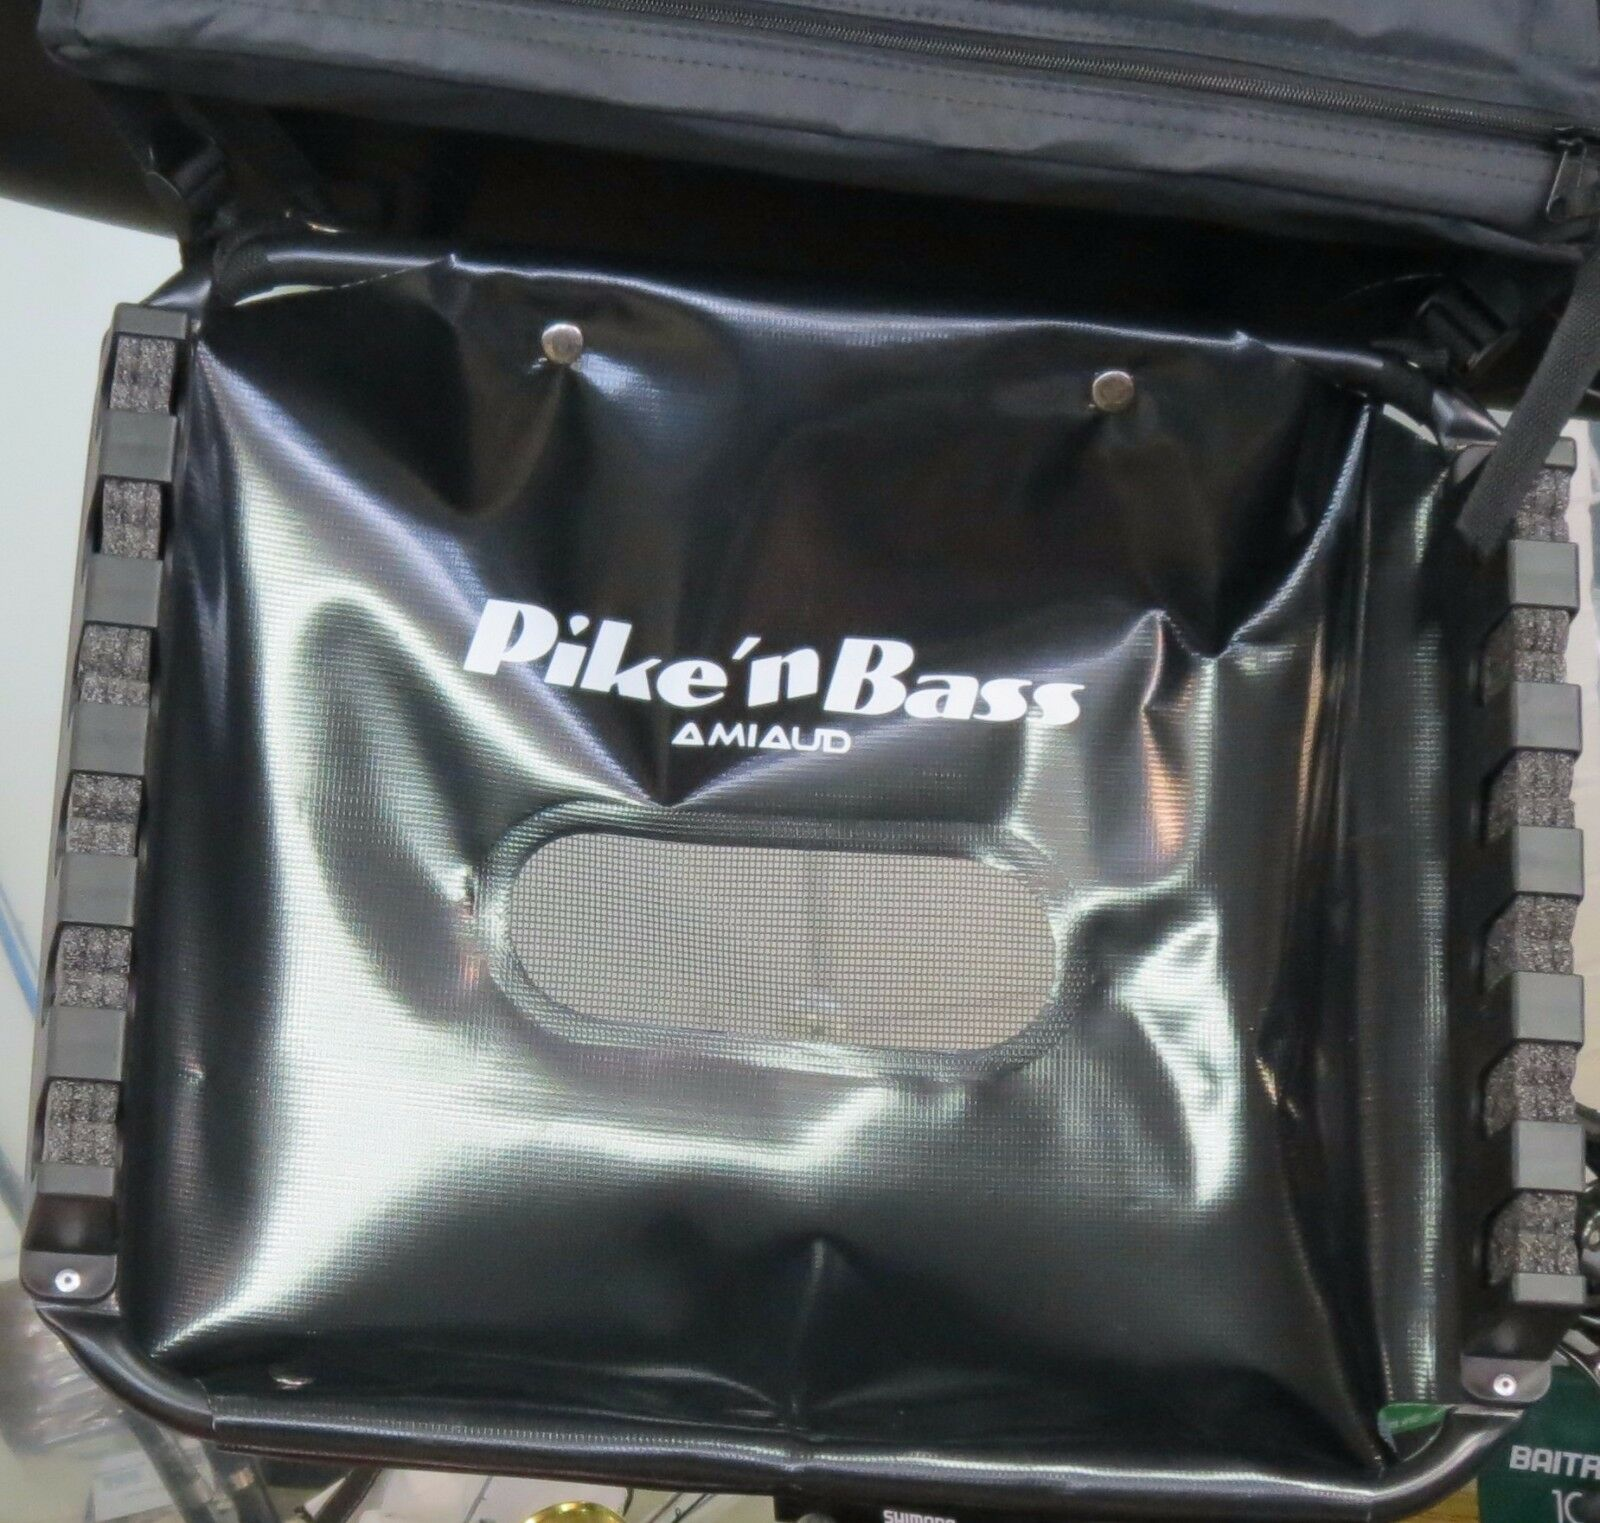 Porte canne pour float tube pike n bass